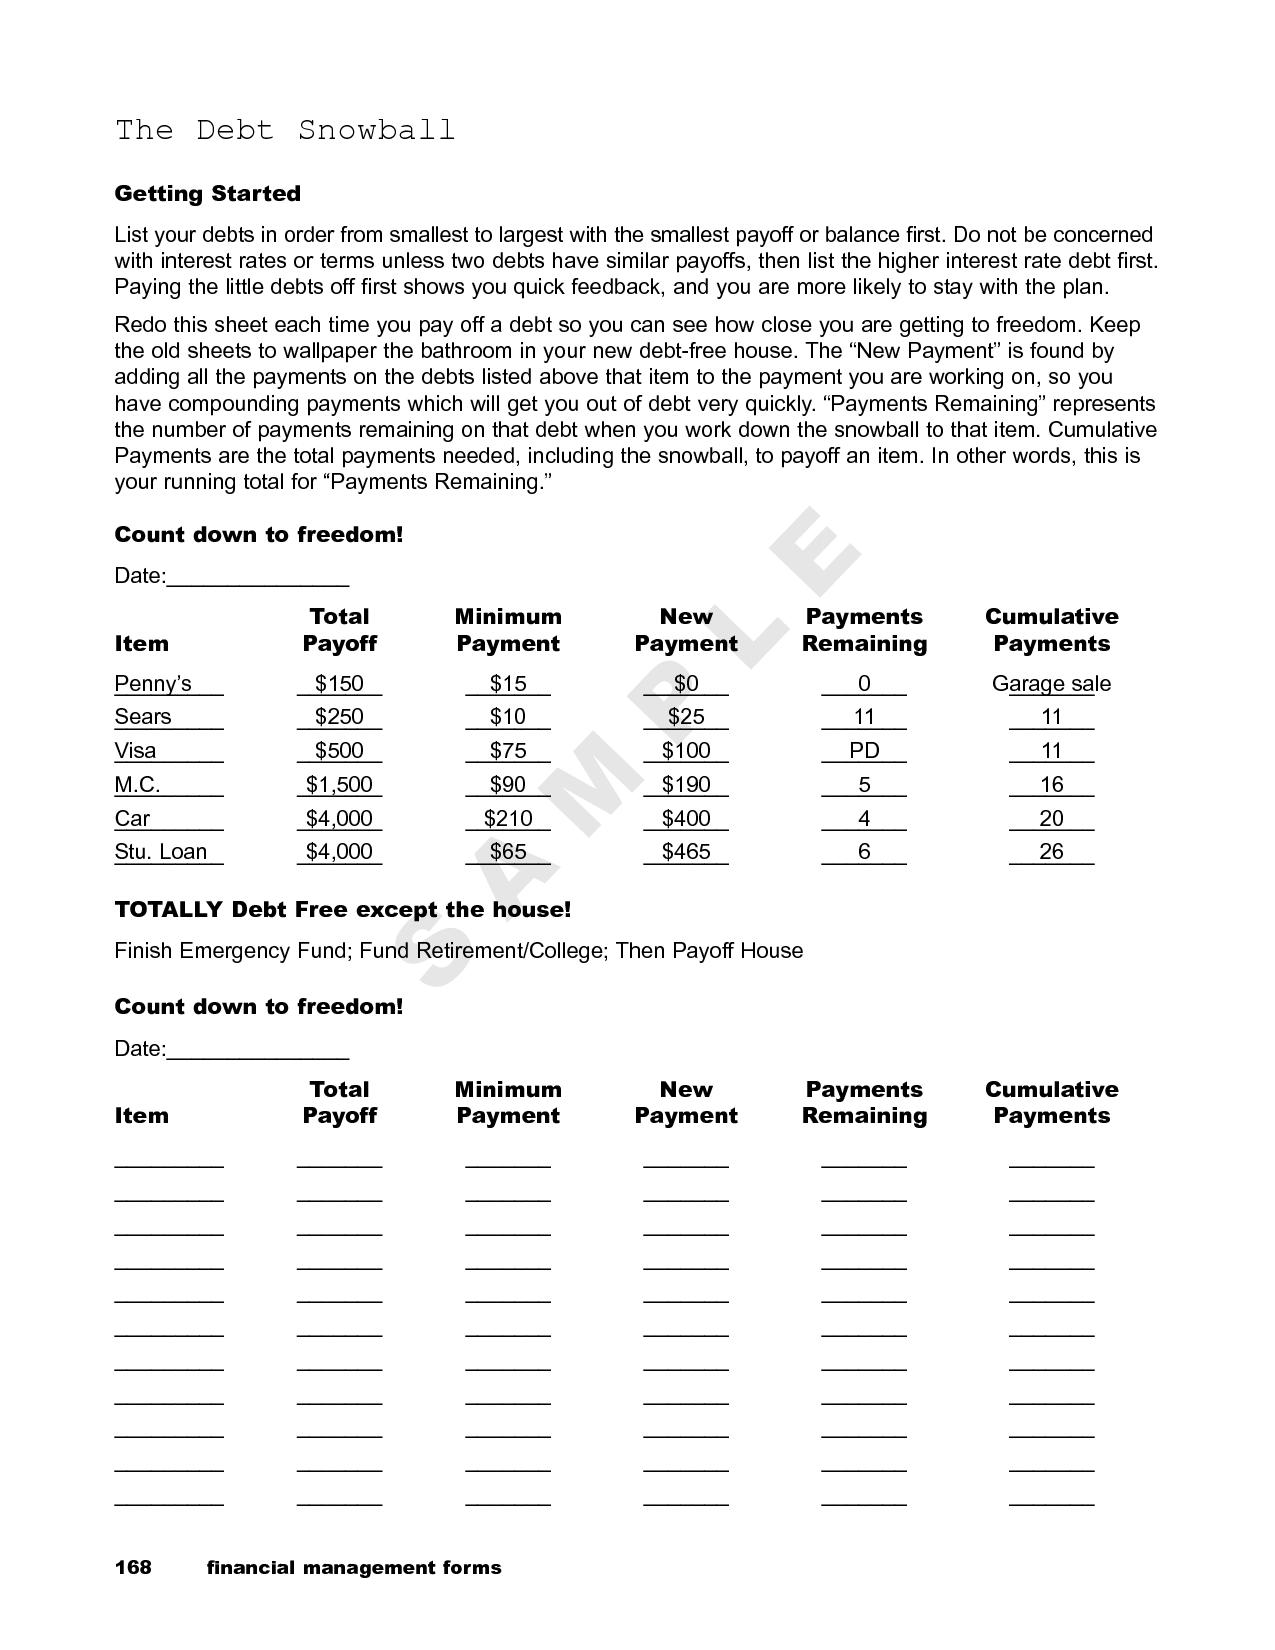 Dave Ramsey Debt Snowball Spreadsheet Free